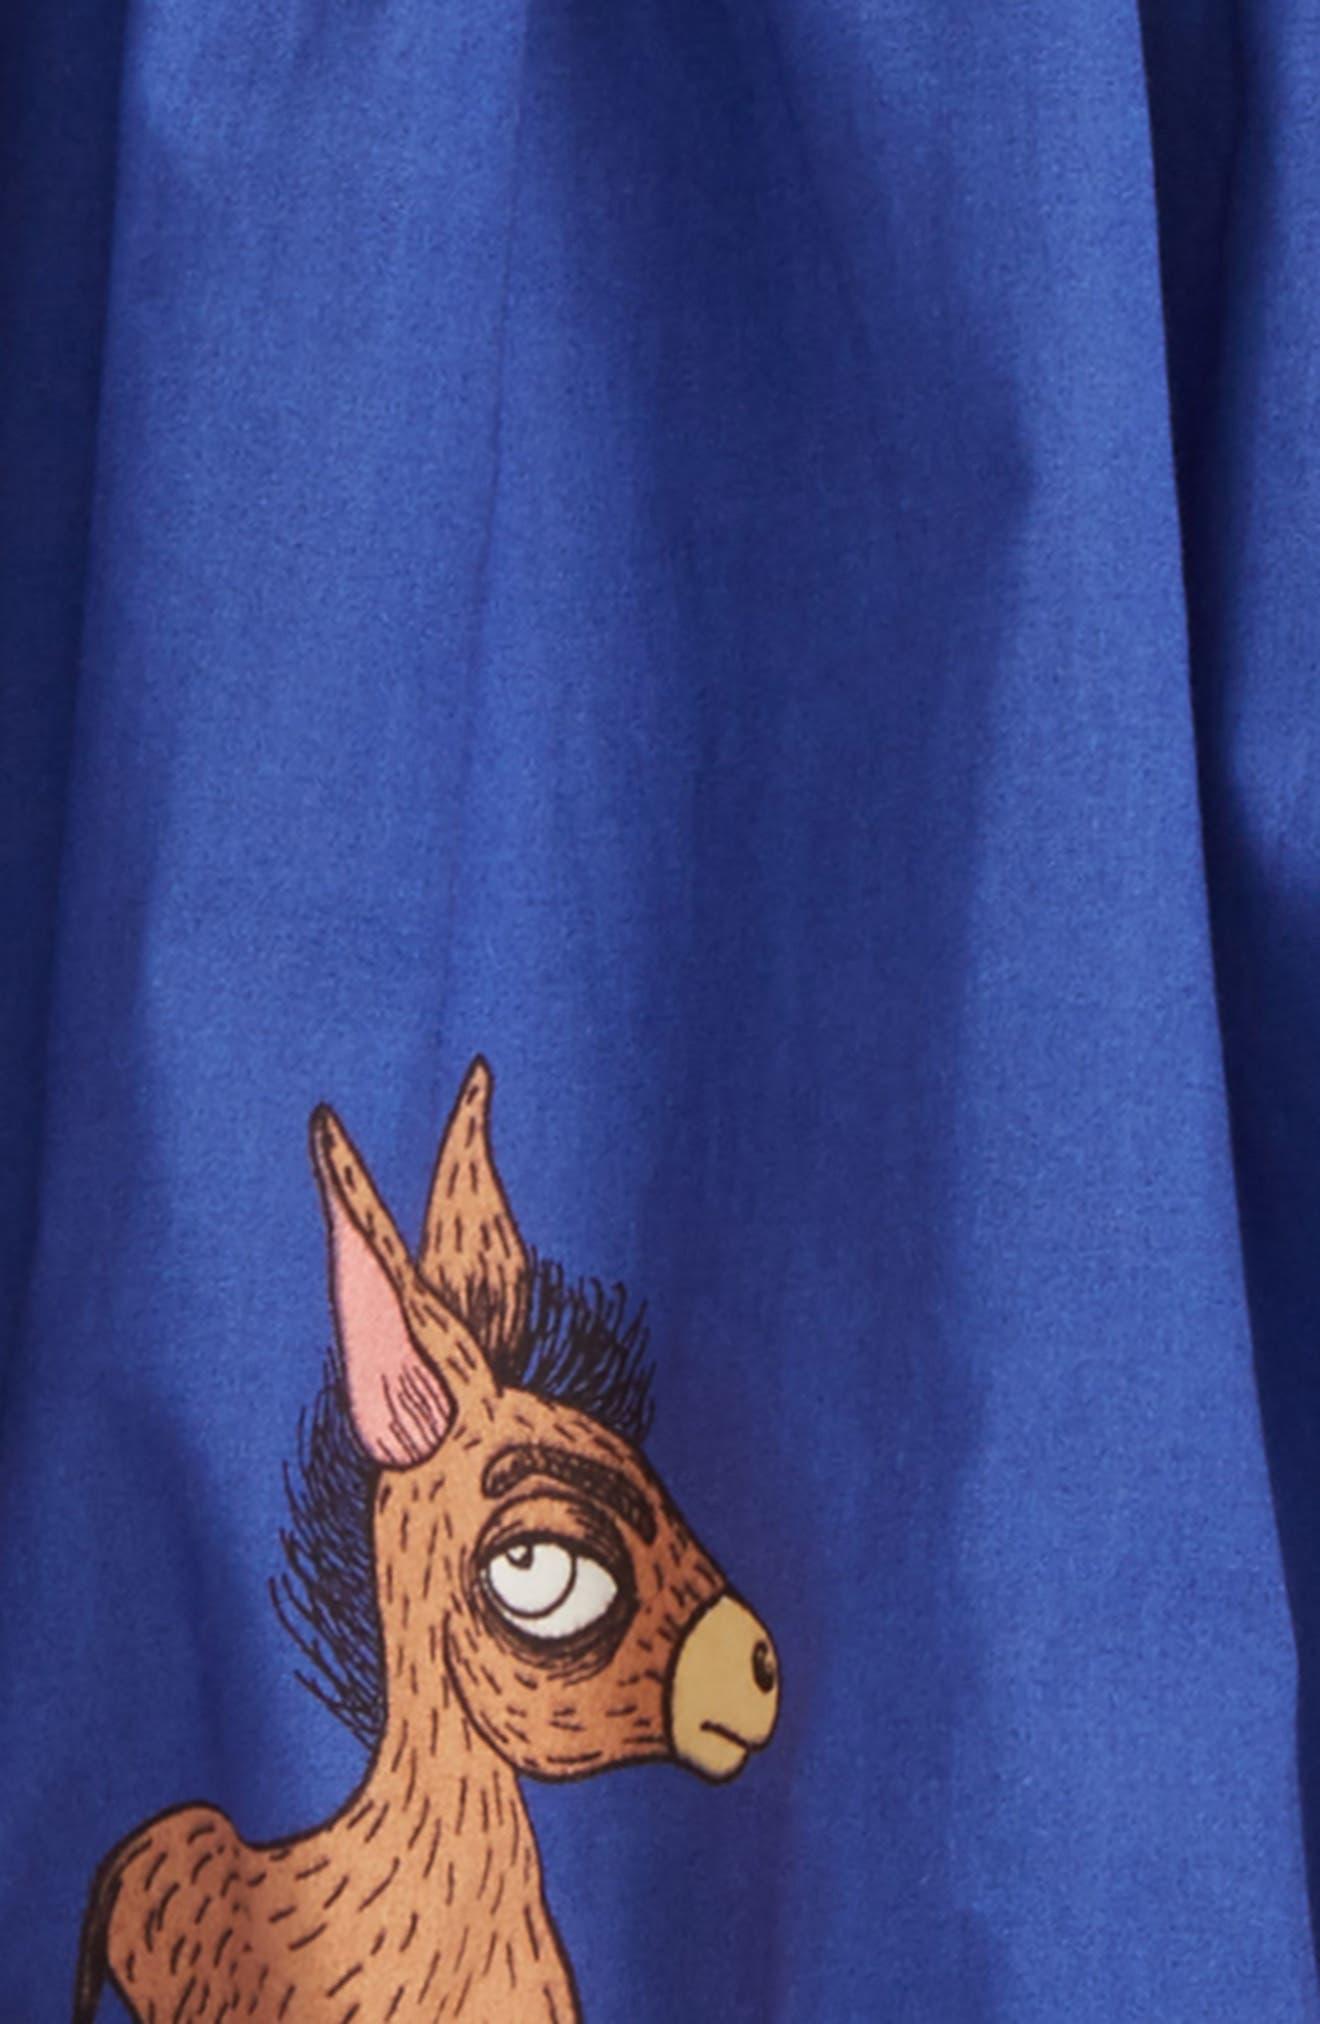 Donkey Print Woven Organic Cotton Balloon Skirt,                             Alternate thumbnail 2, color,                             400